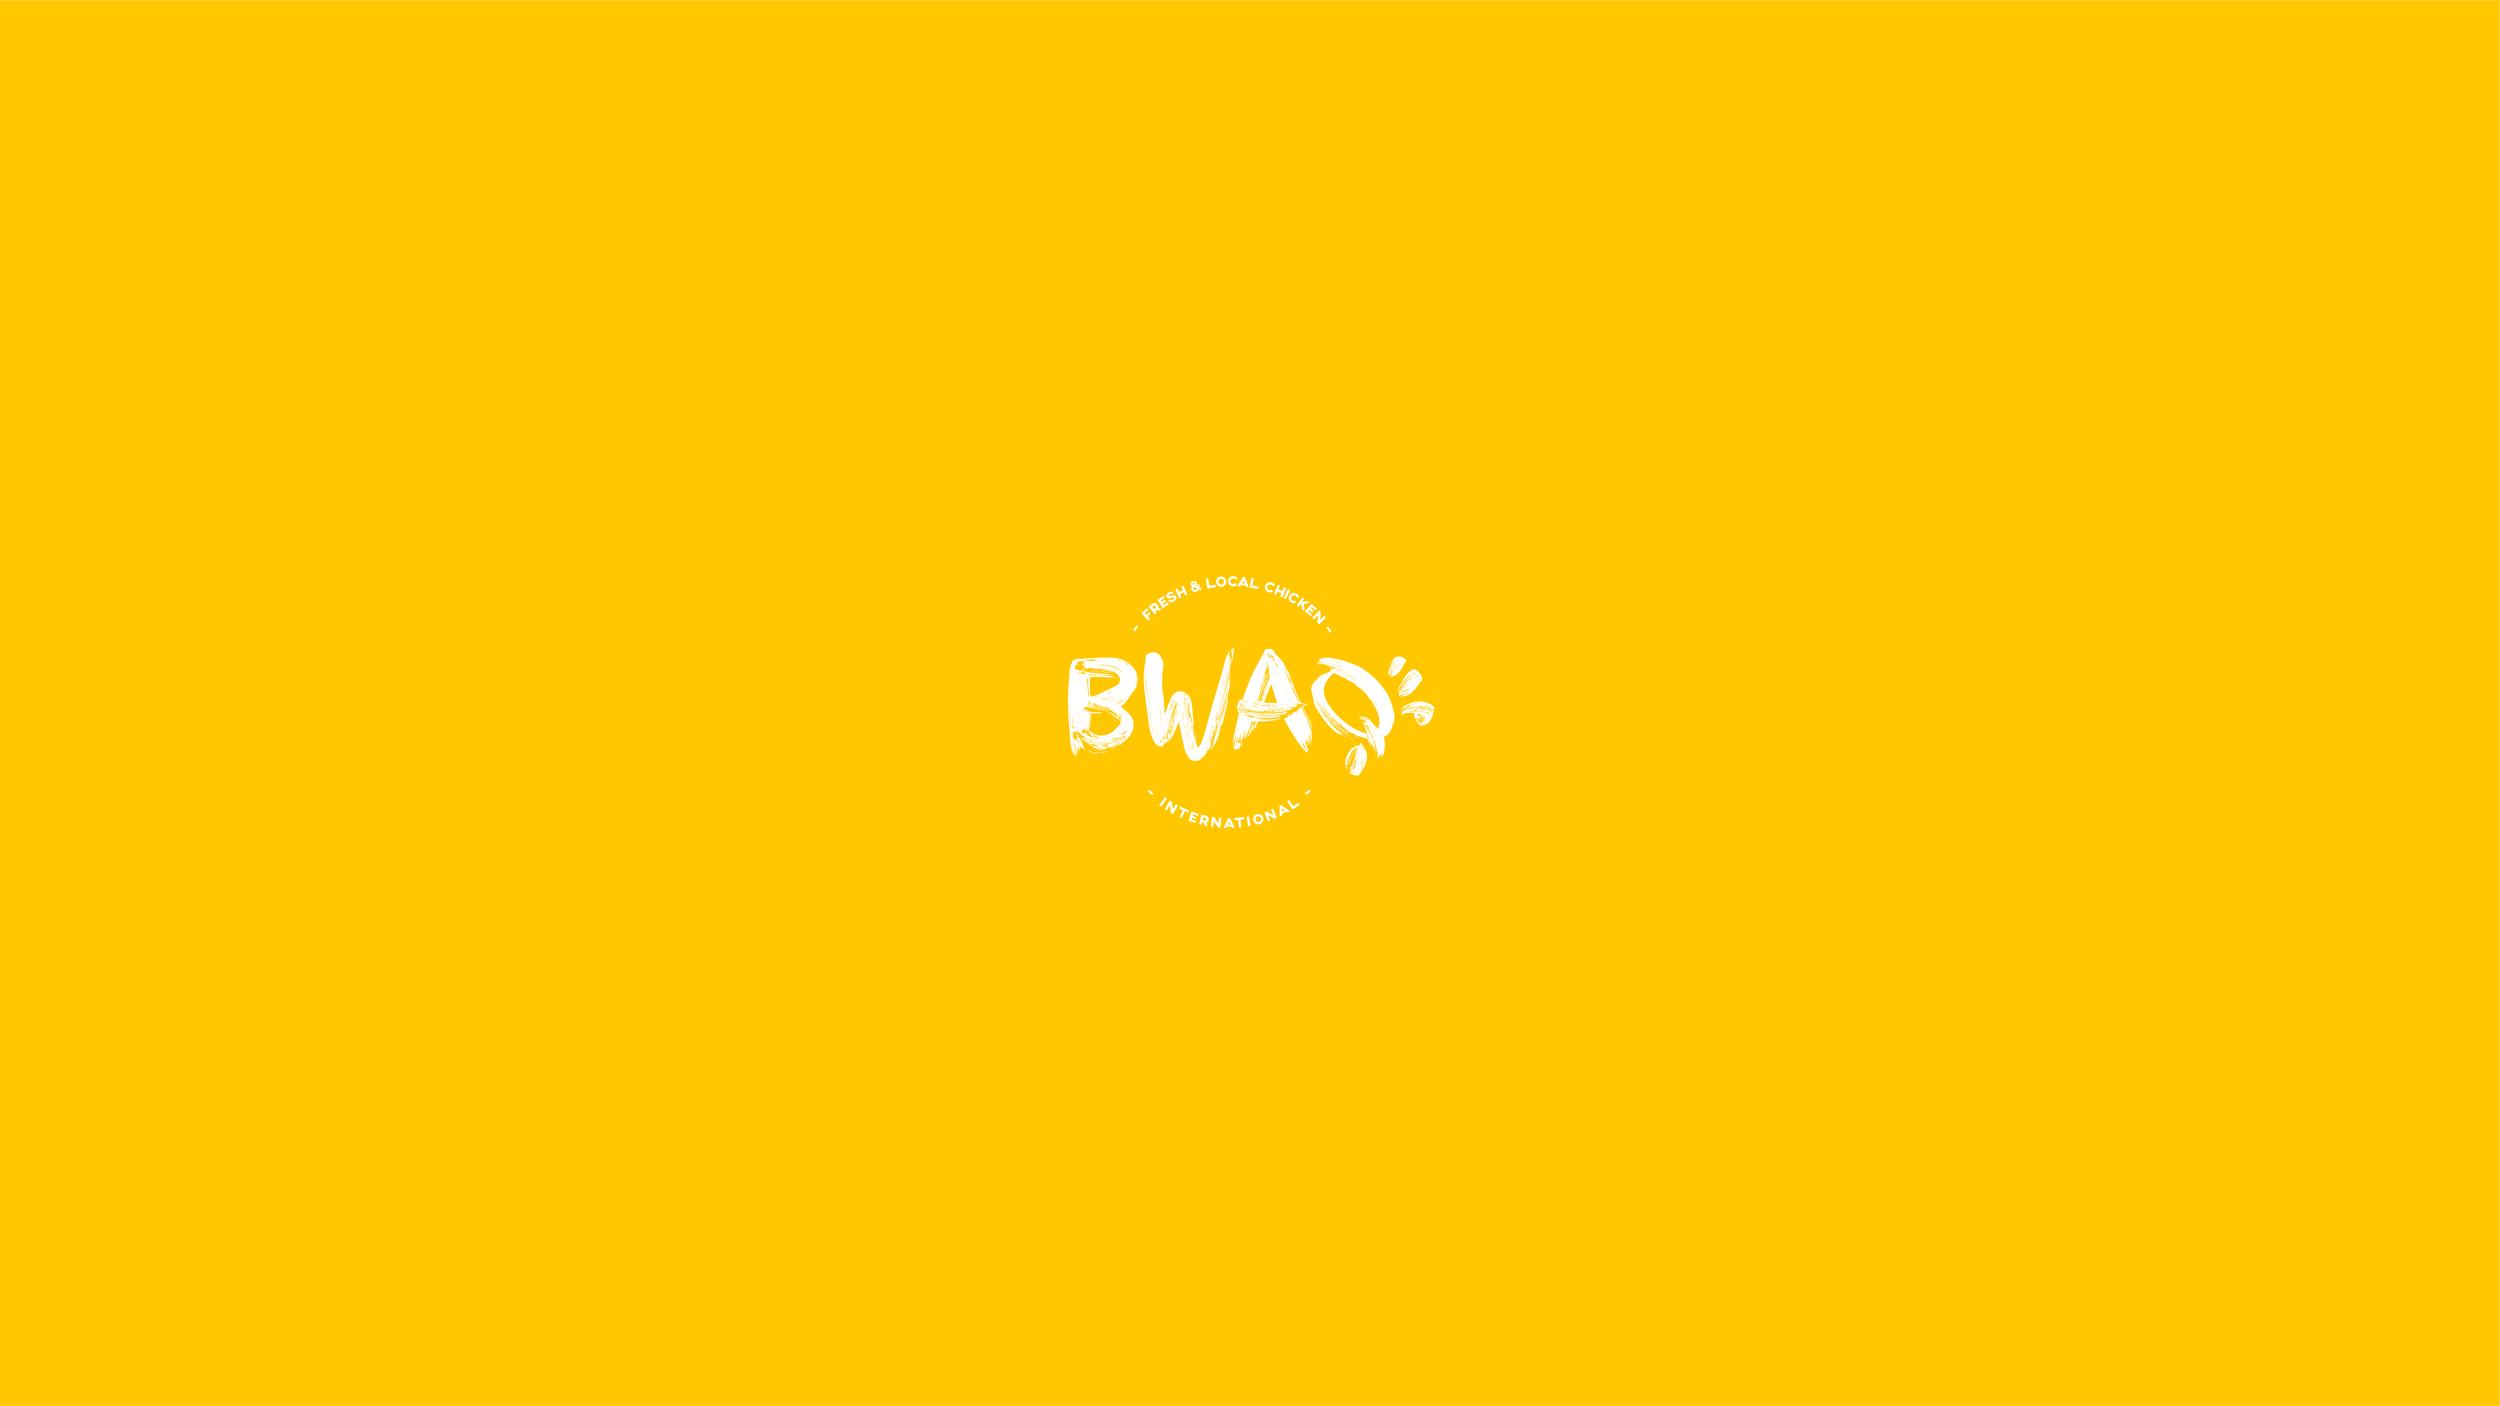 BWAQ  Social model's logo for Malawi restaurant chain